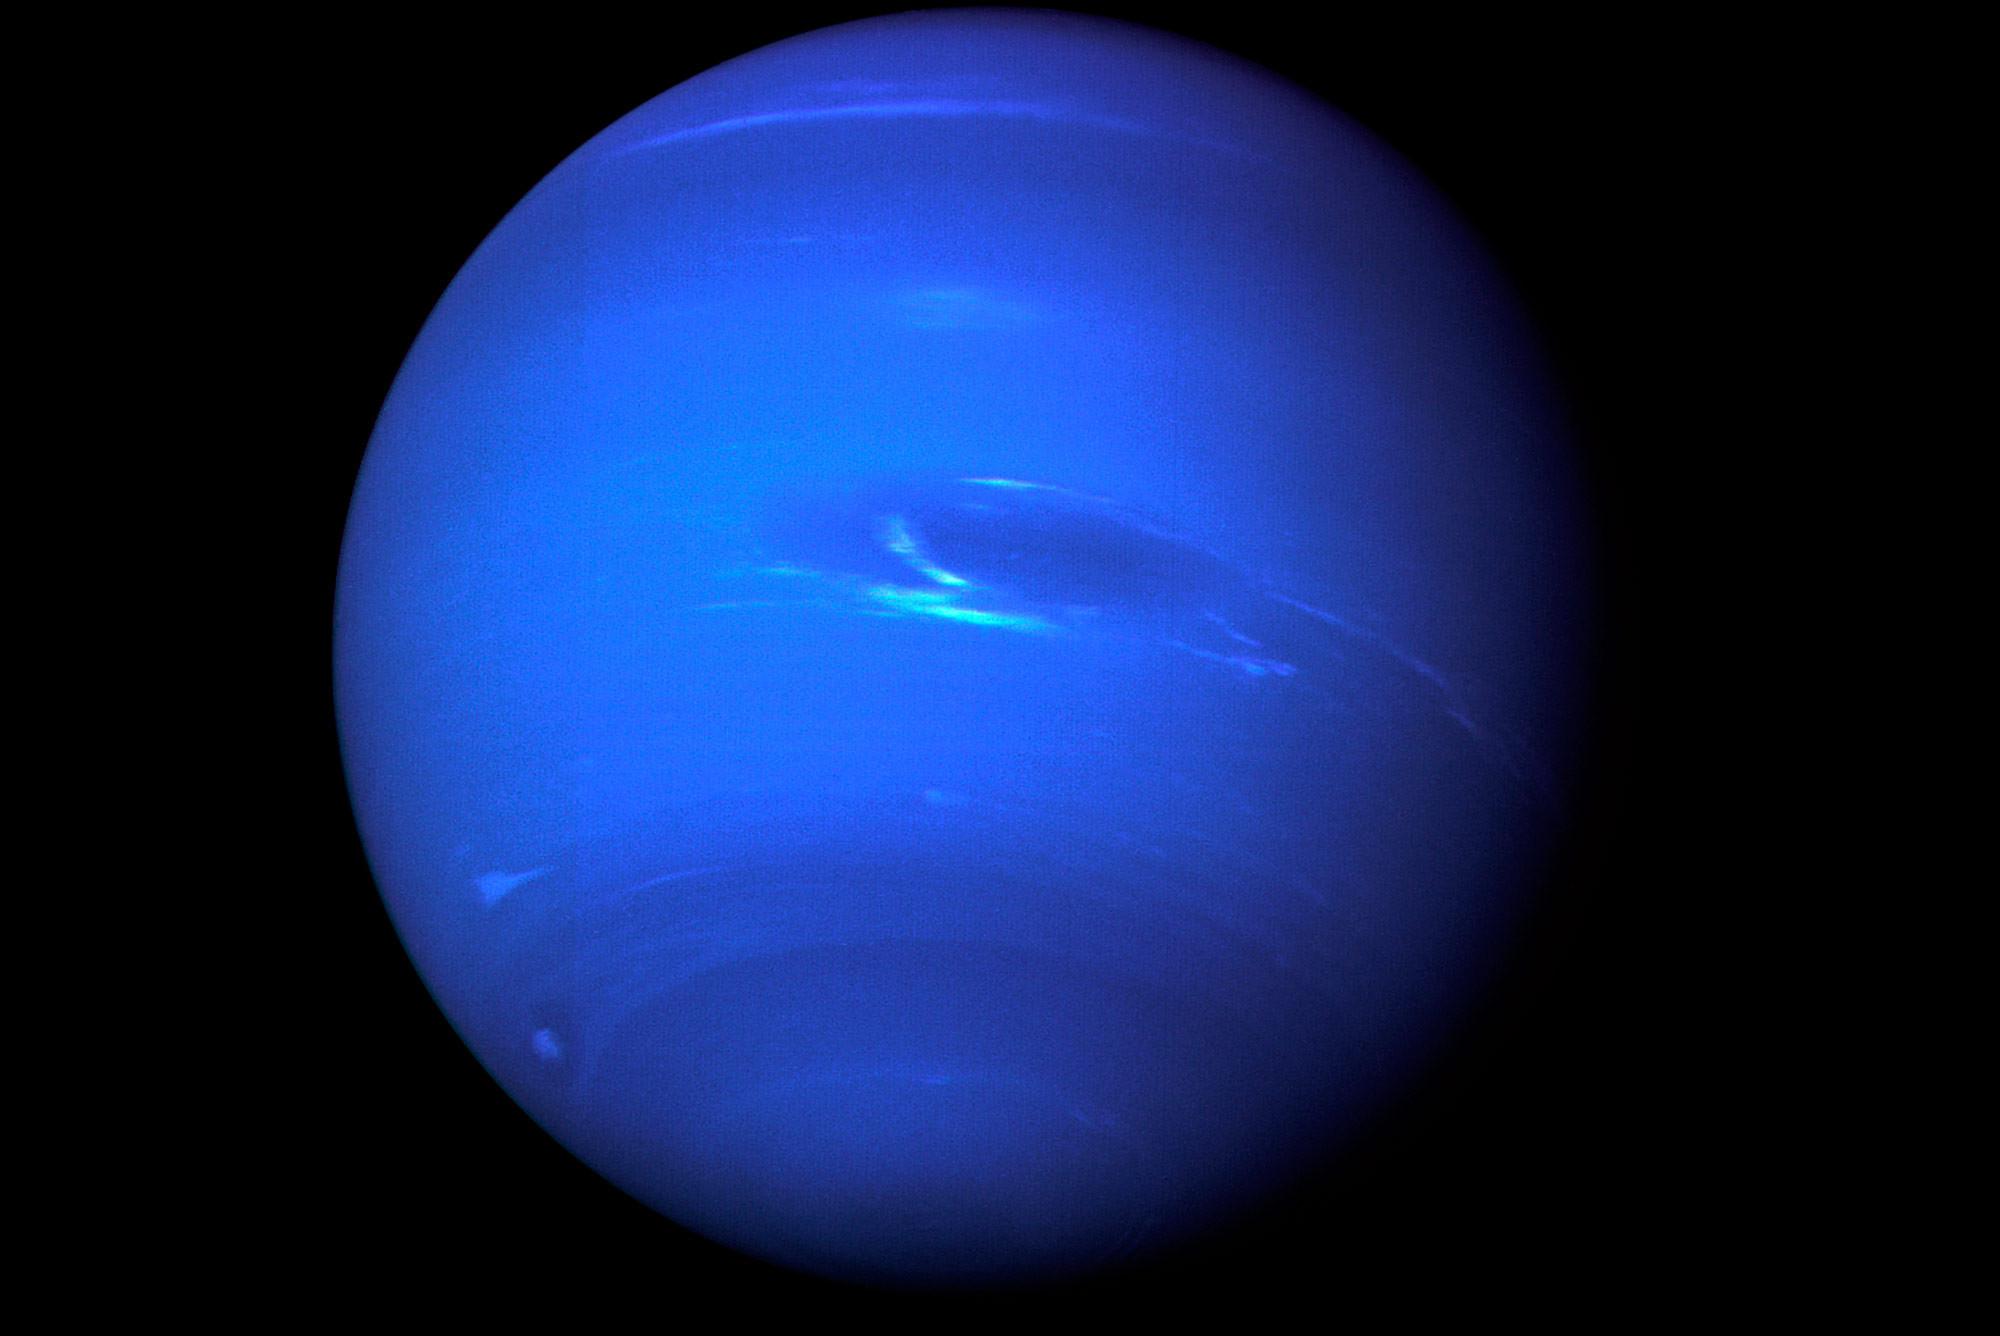 <p><span>Планета Нептун. Фото: &copy; NASA/Voyager</span></p>